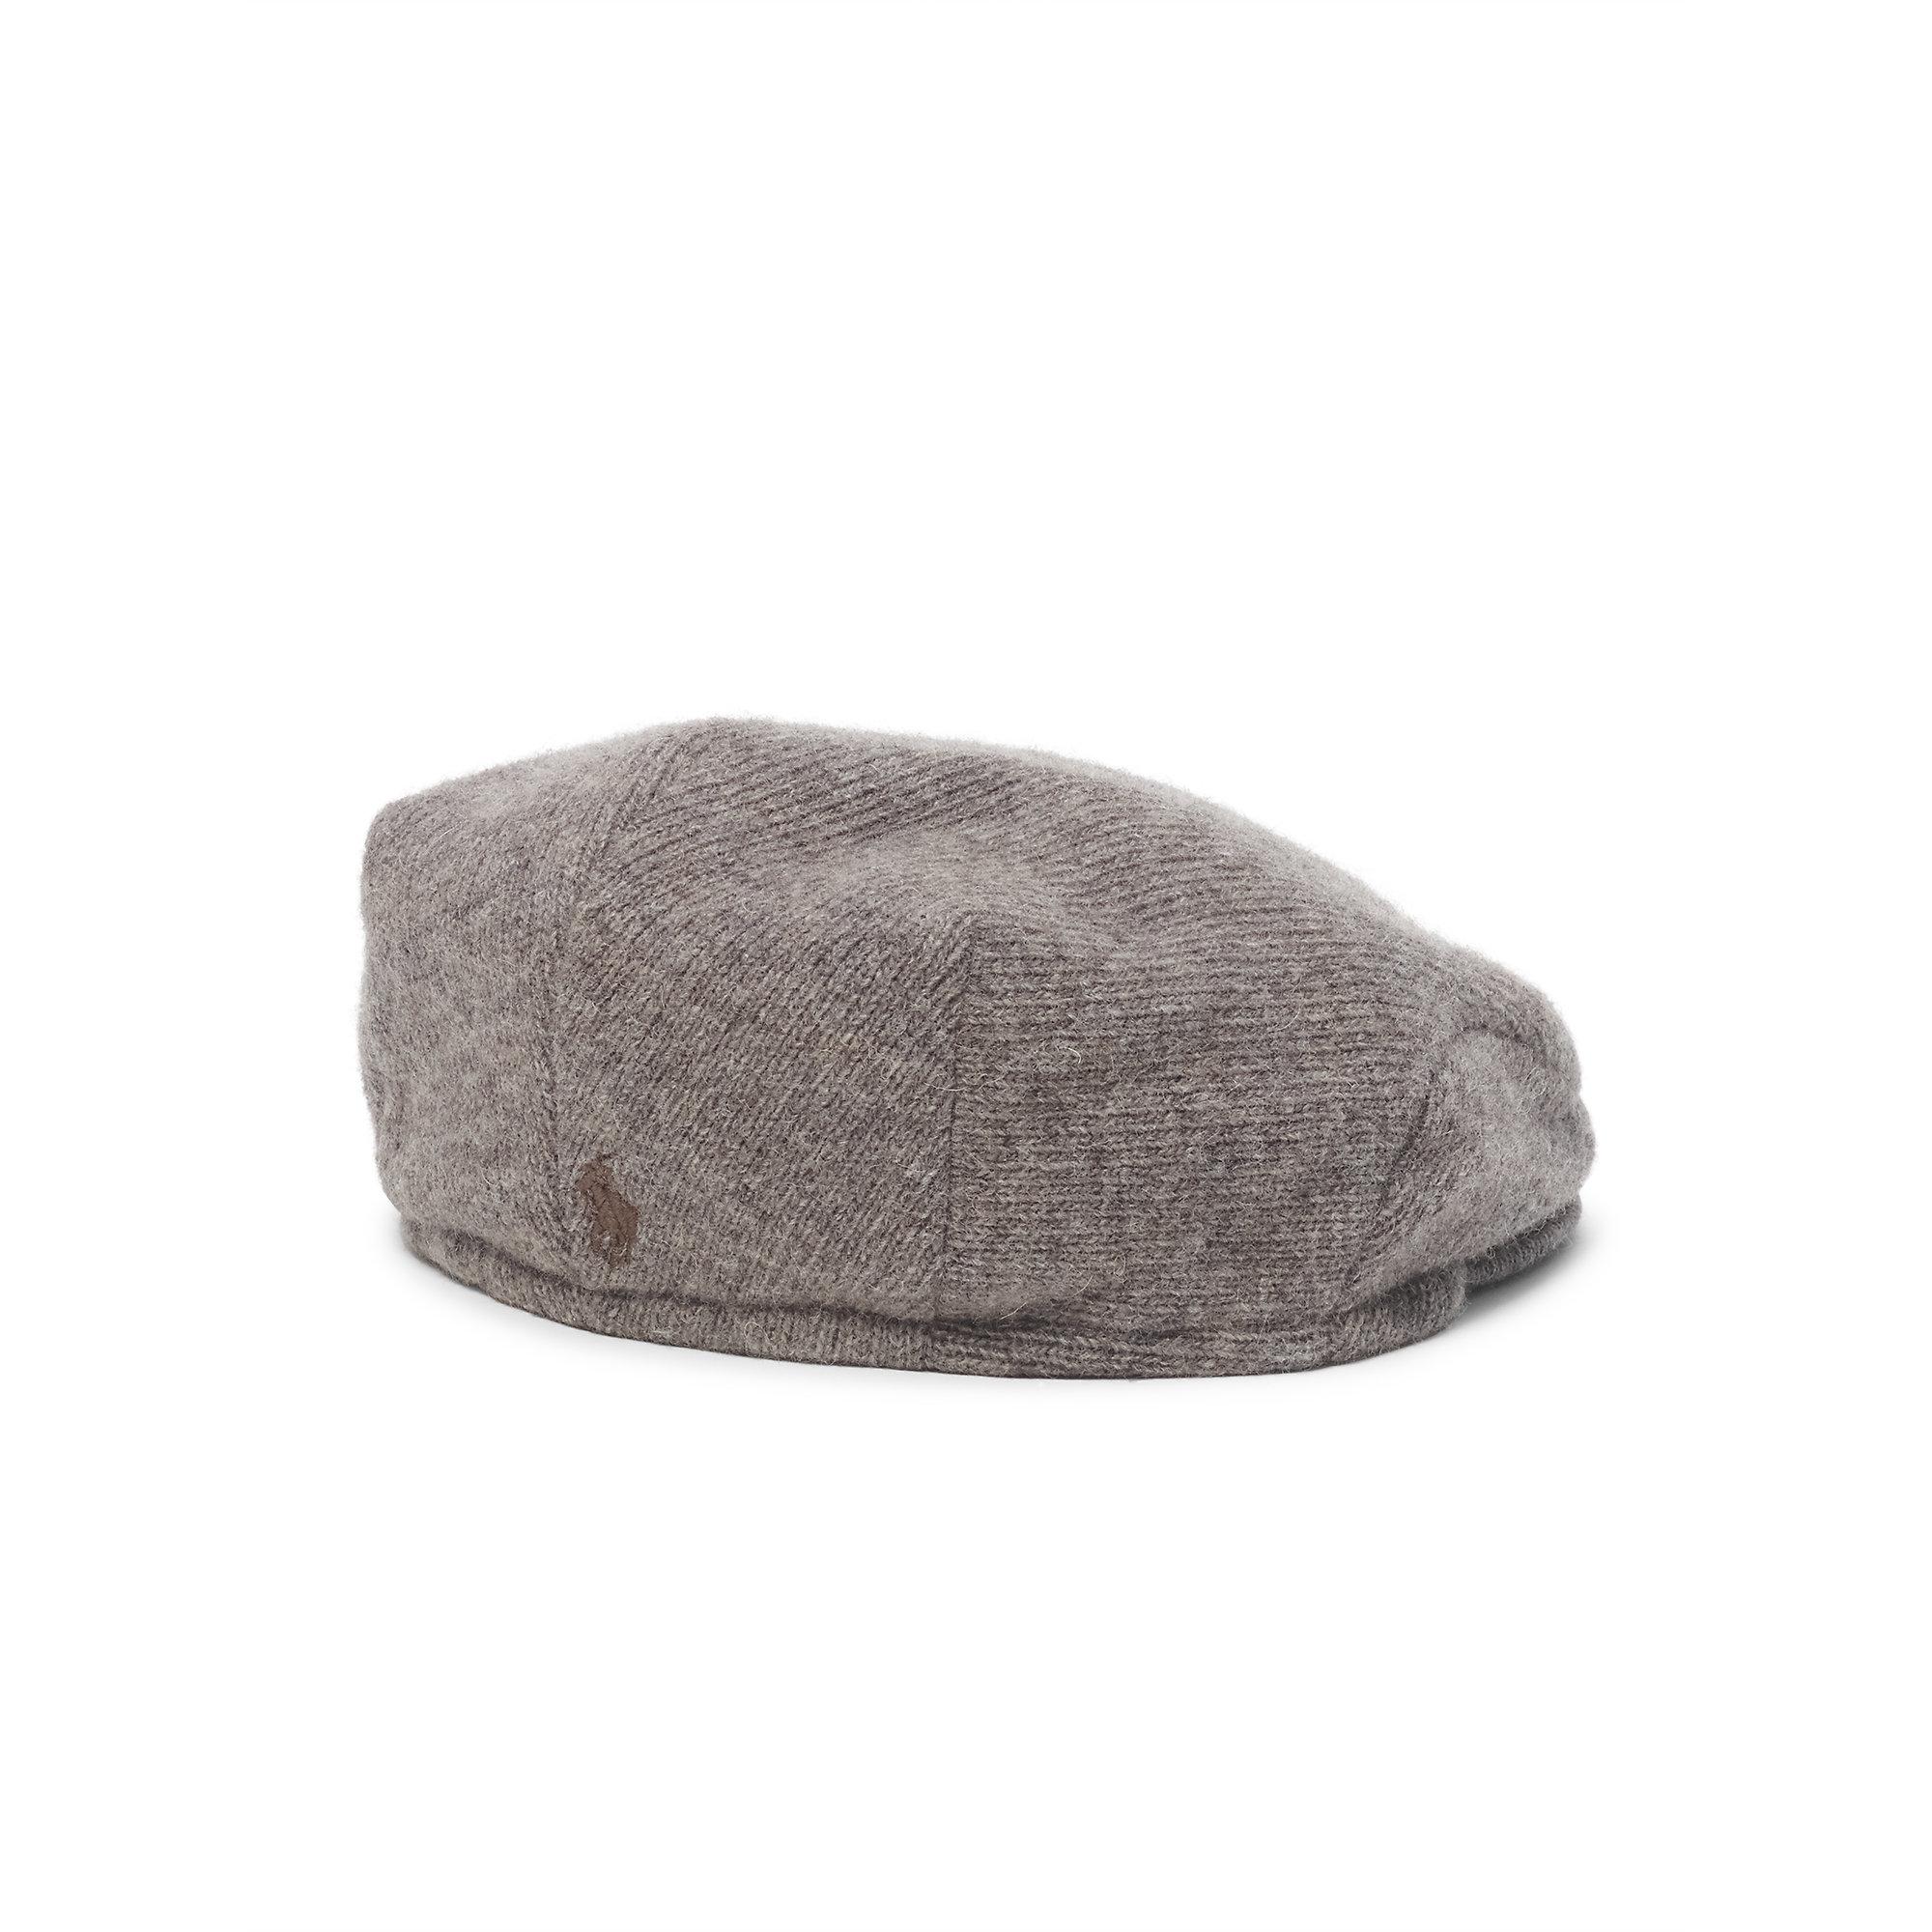 8dc1fad0 ... lyst polo ralph lauren wool blend driving cap in brown for men